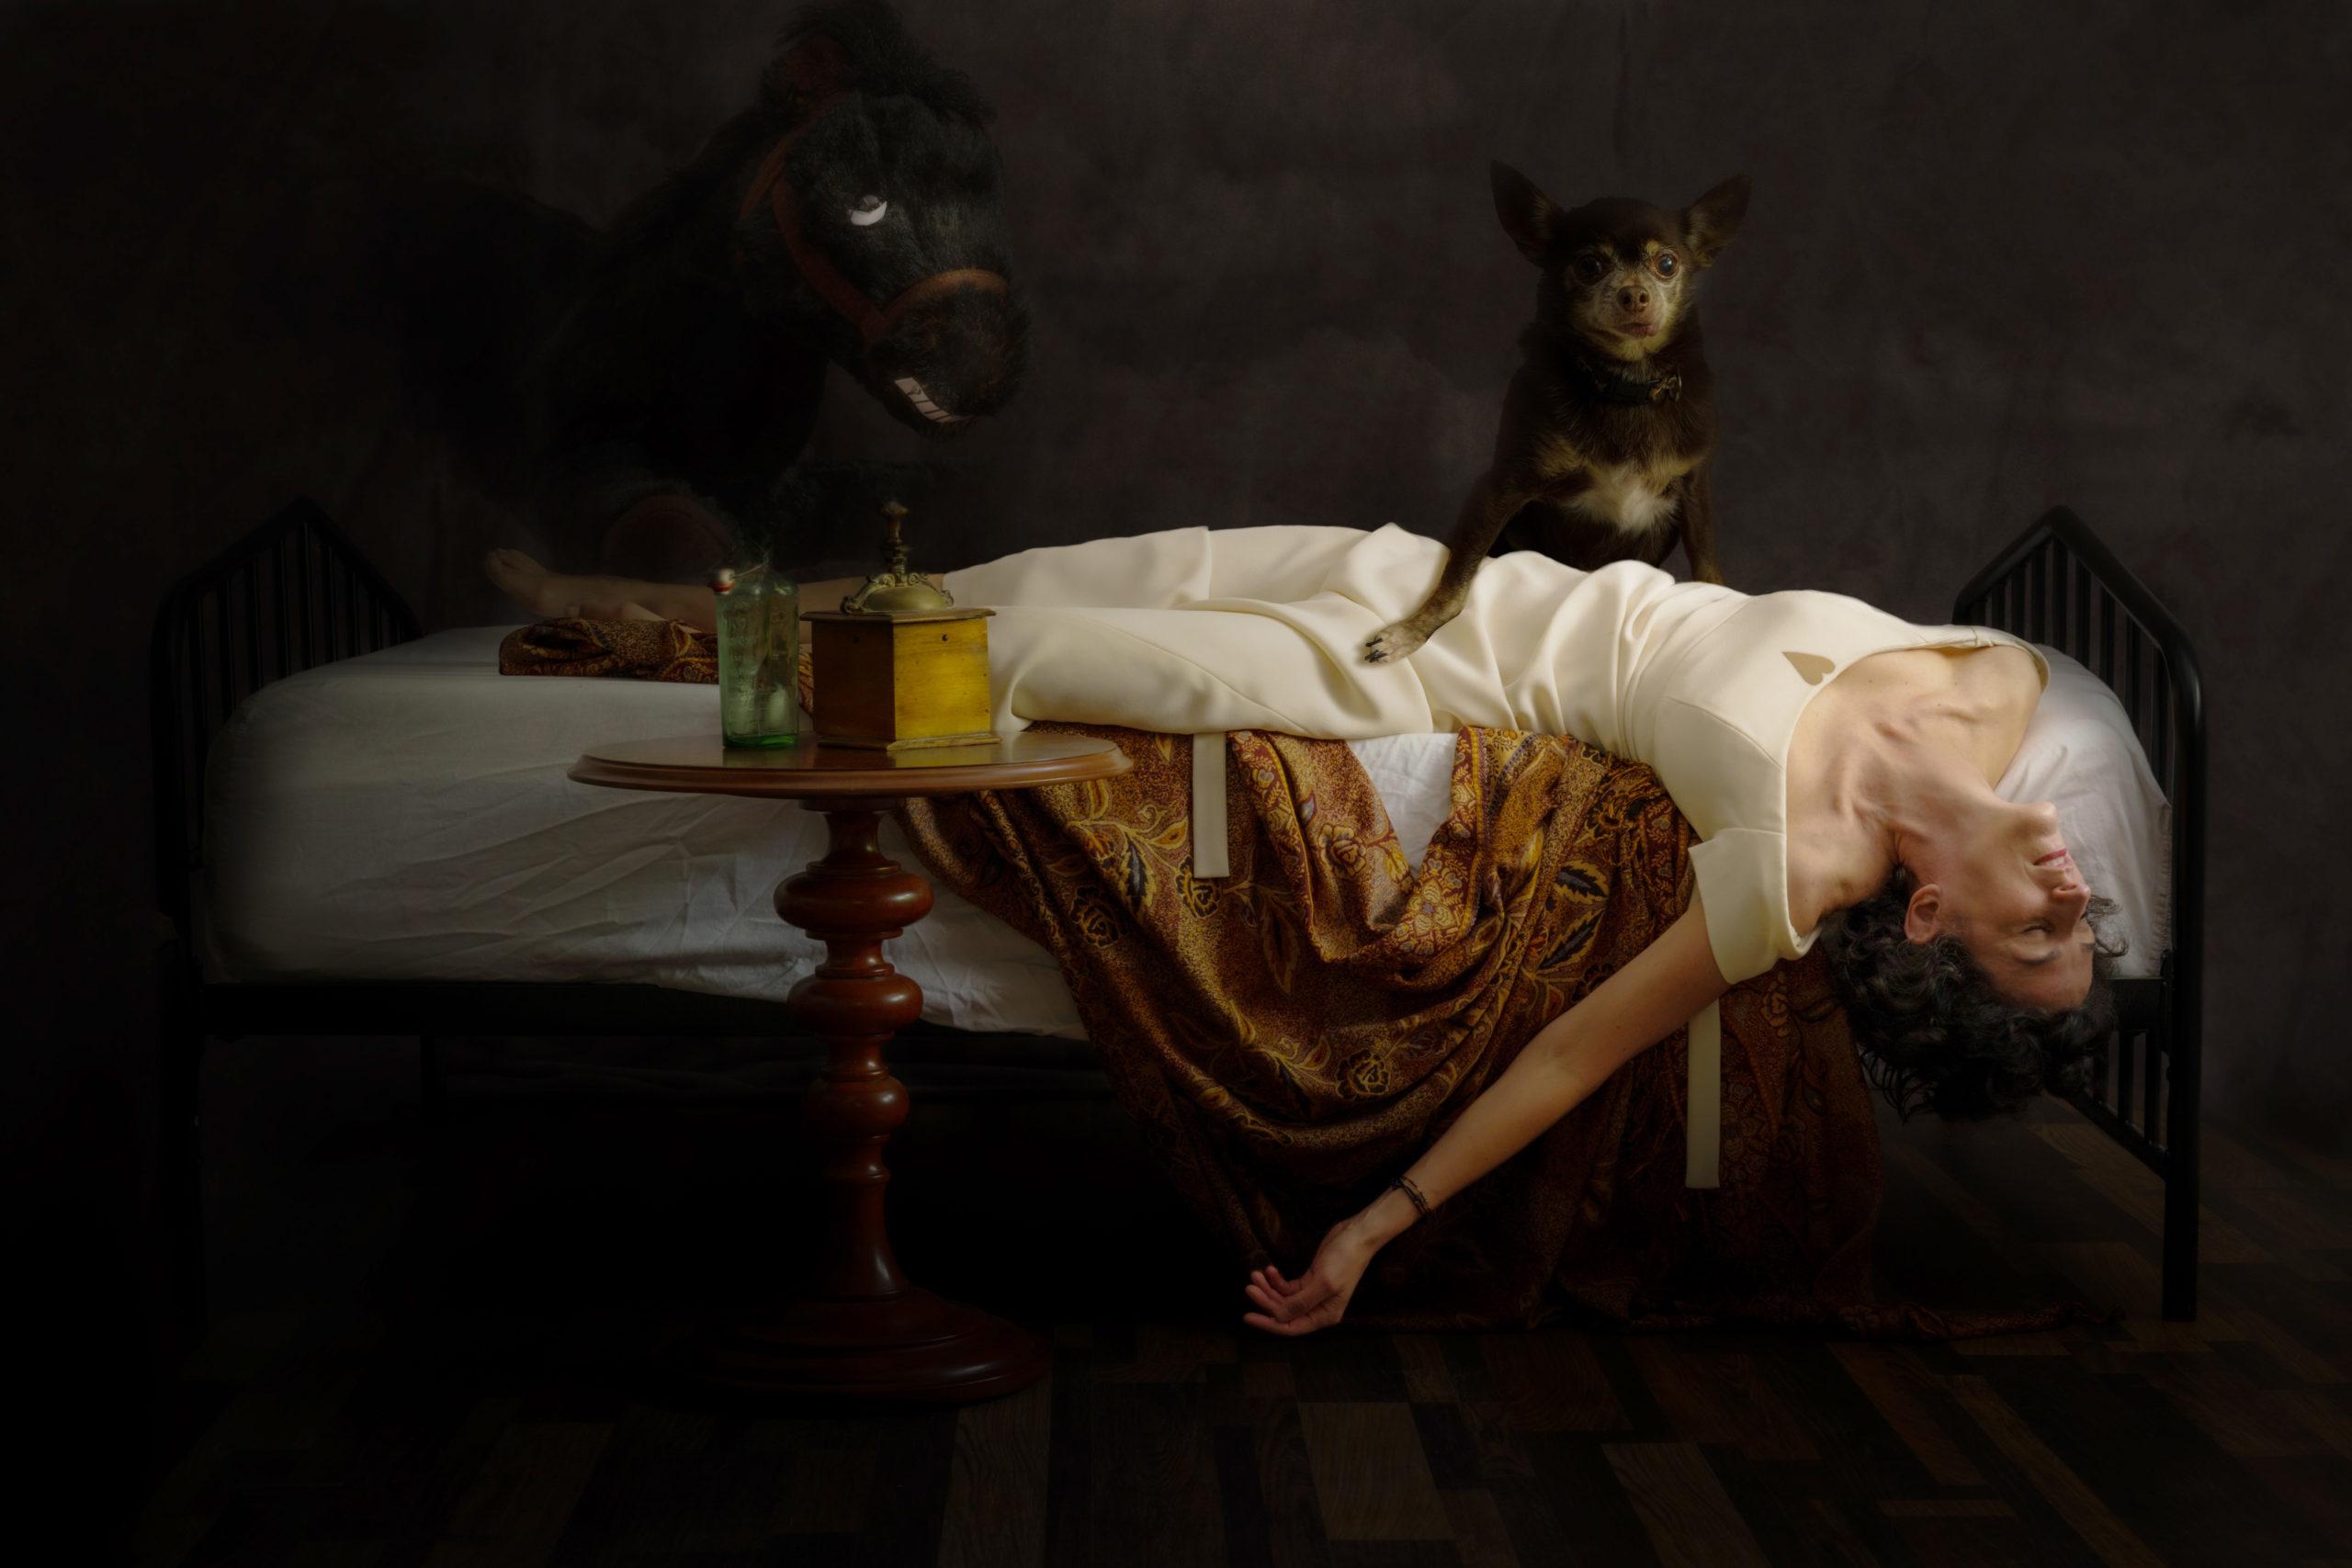 Recereating Fuseli's 'The Nightmare' | Matt Giraud Photography